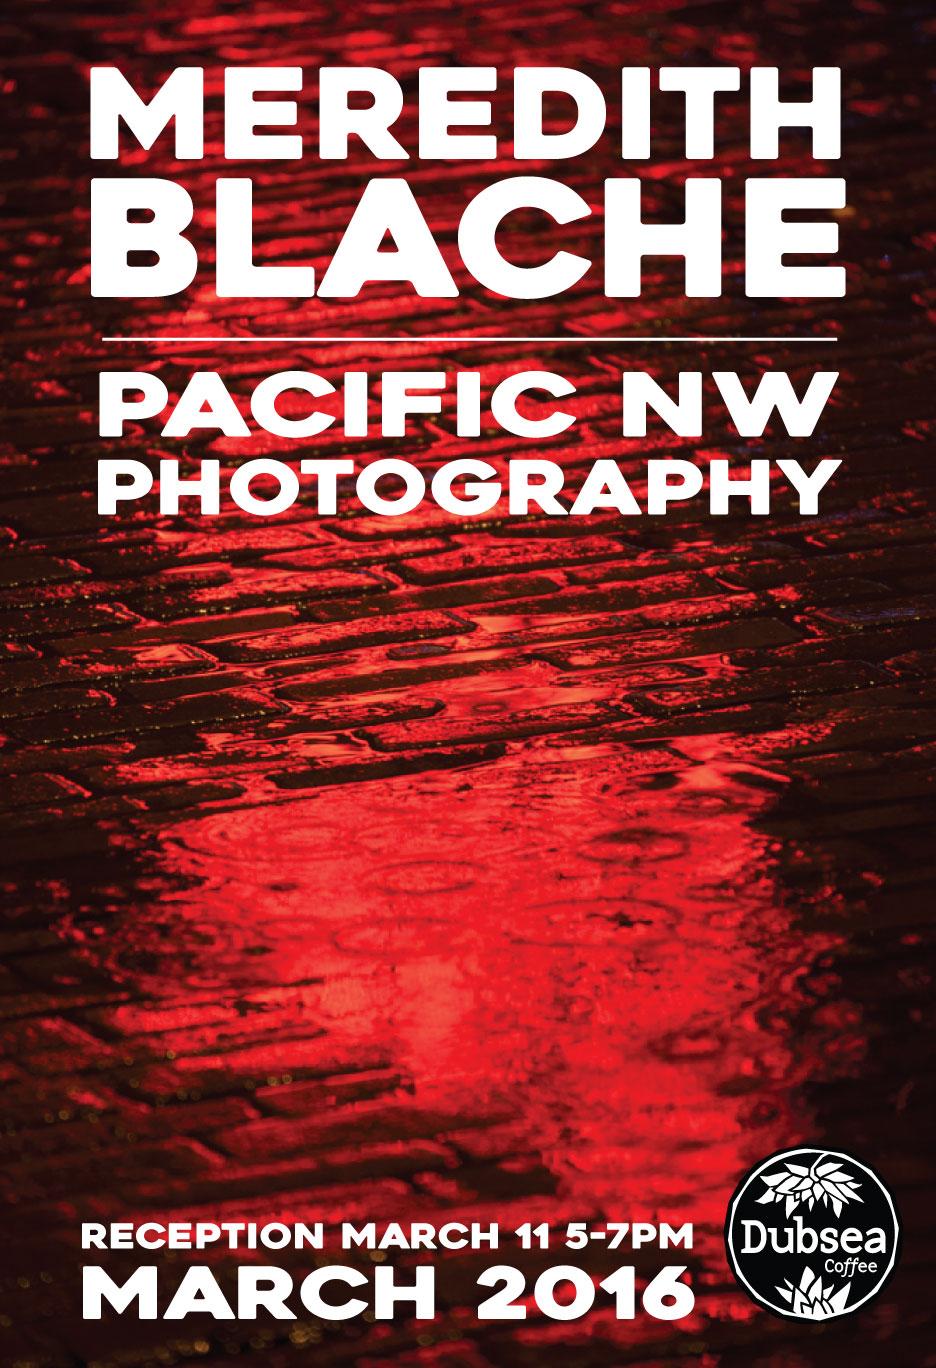 Meredith-Blache-Poster.jpg